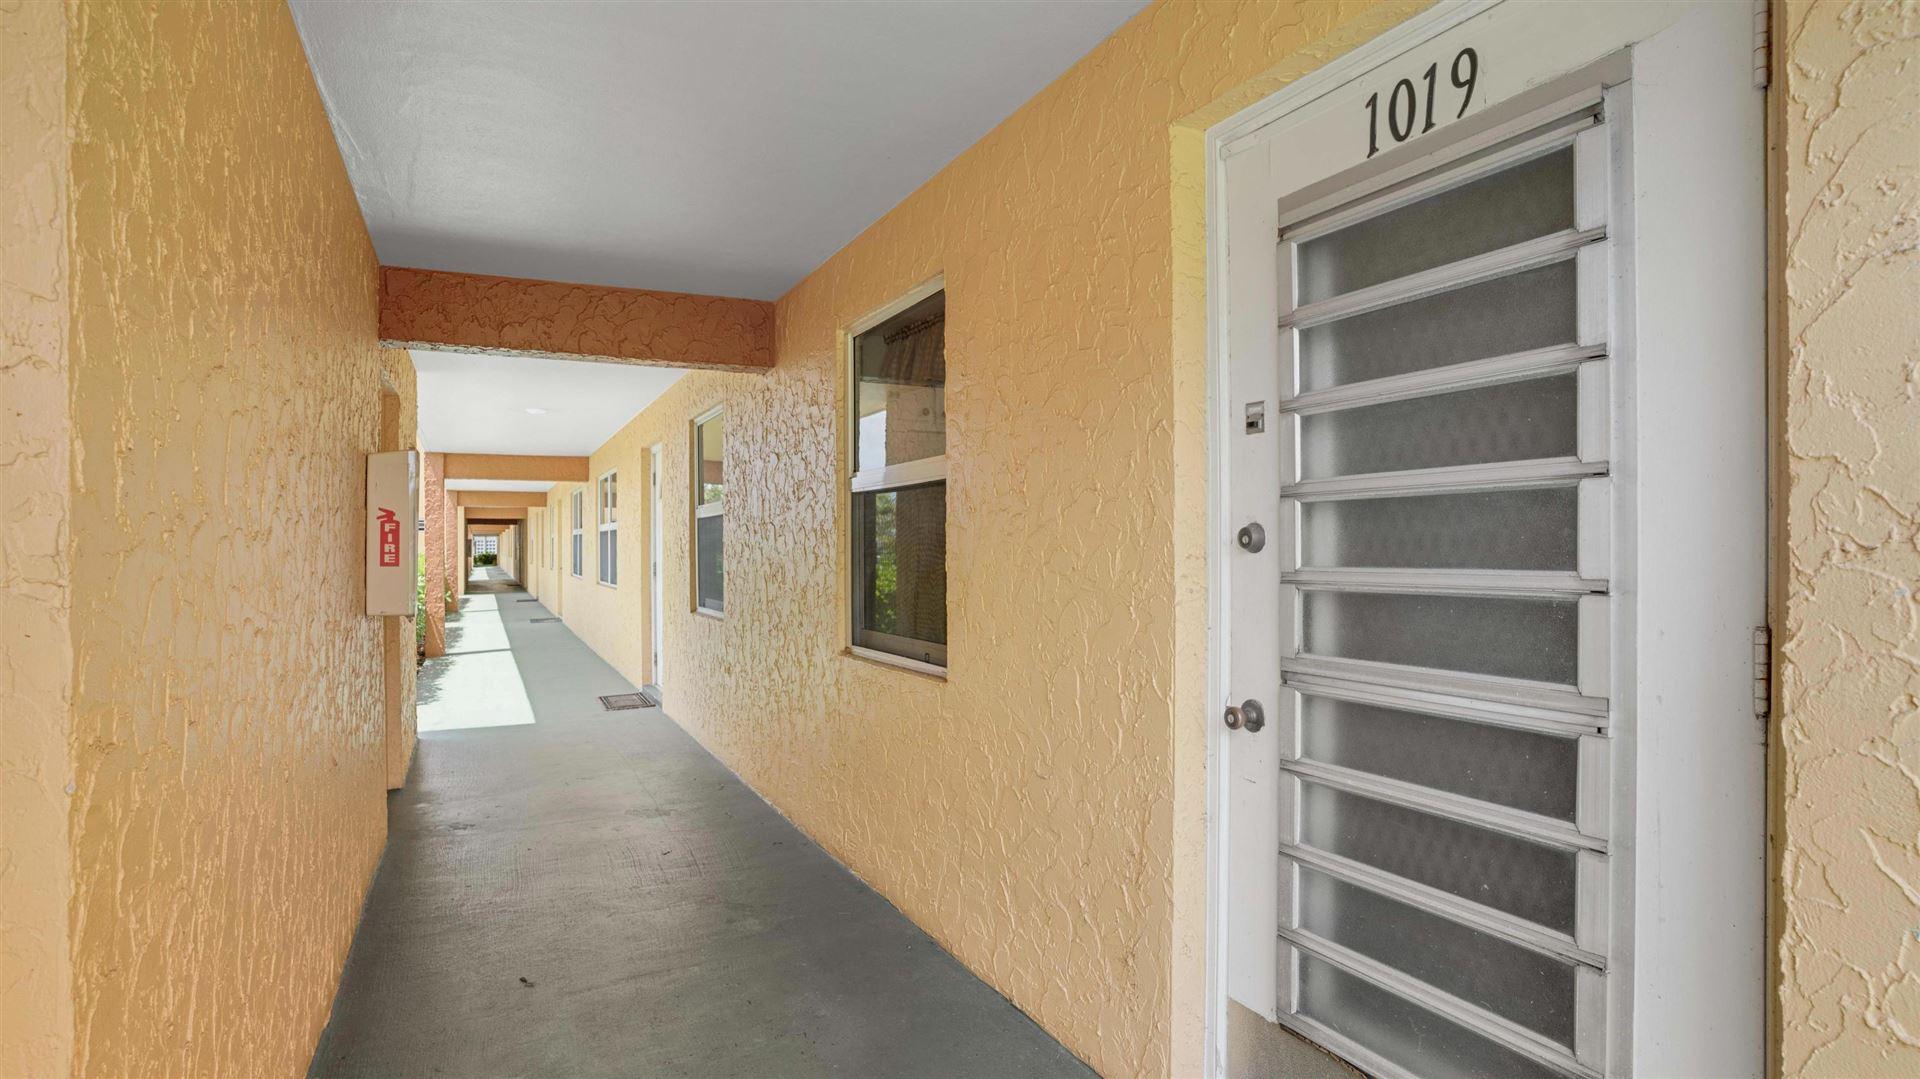 Photo of 9826 Marina Blvd #1019, Boca Raton, FL 33428 (MLS # RX-10733709)